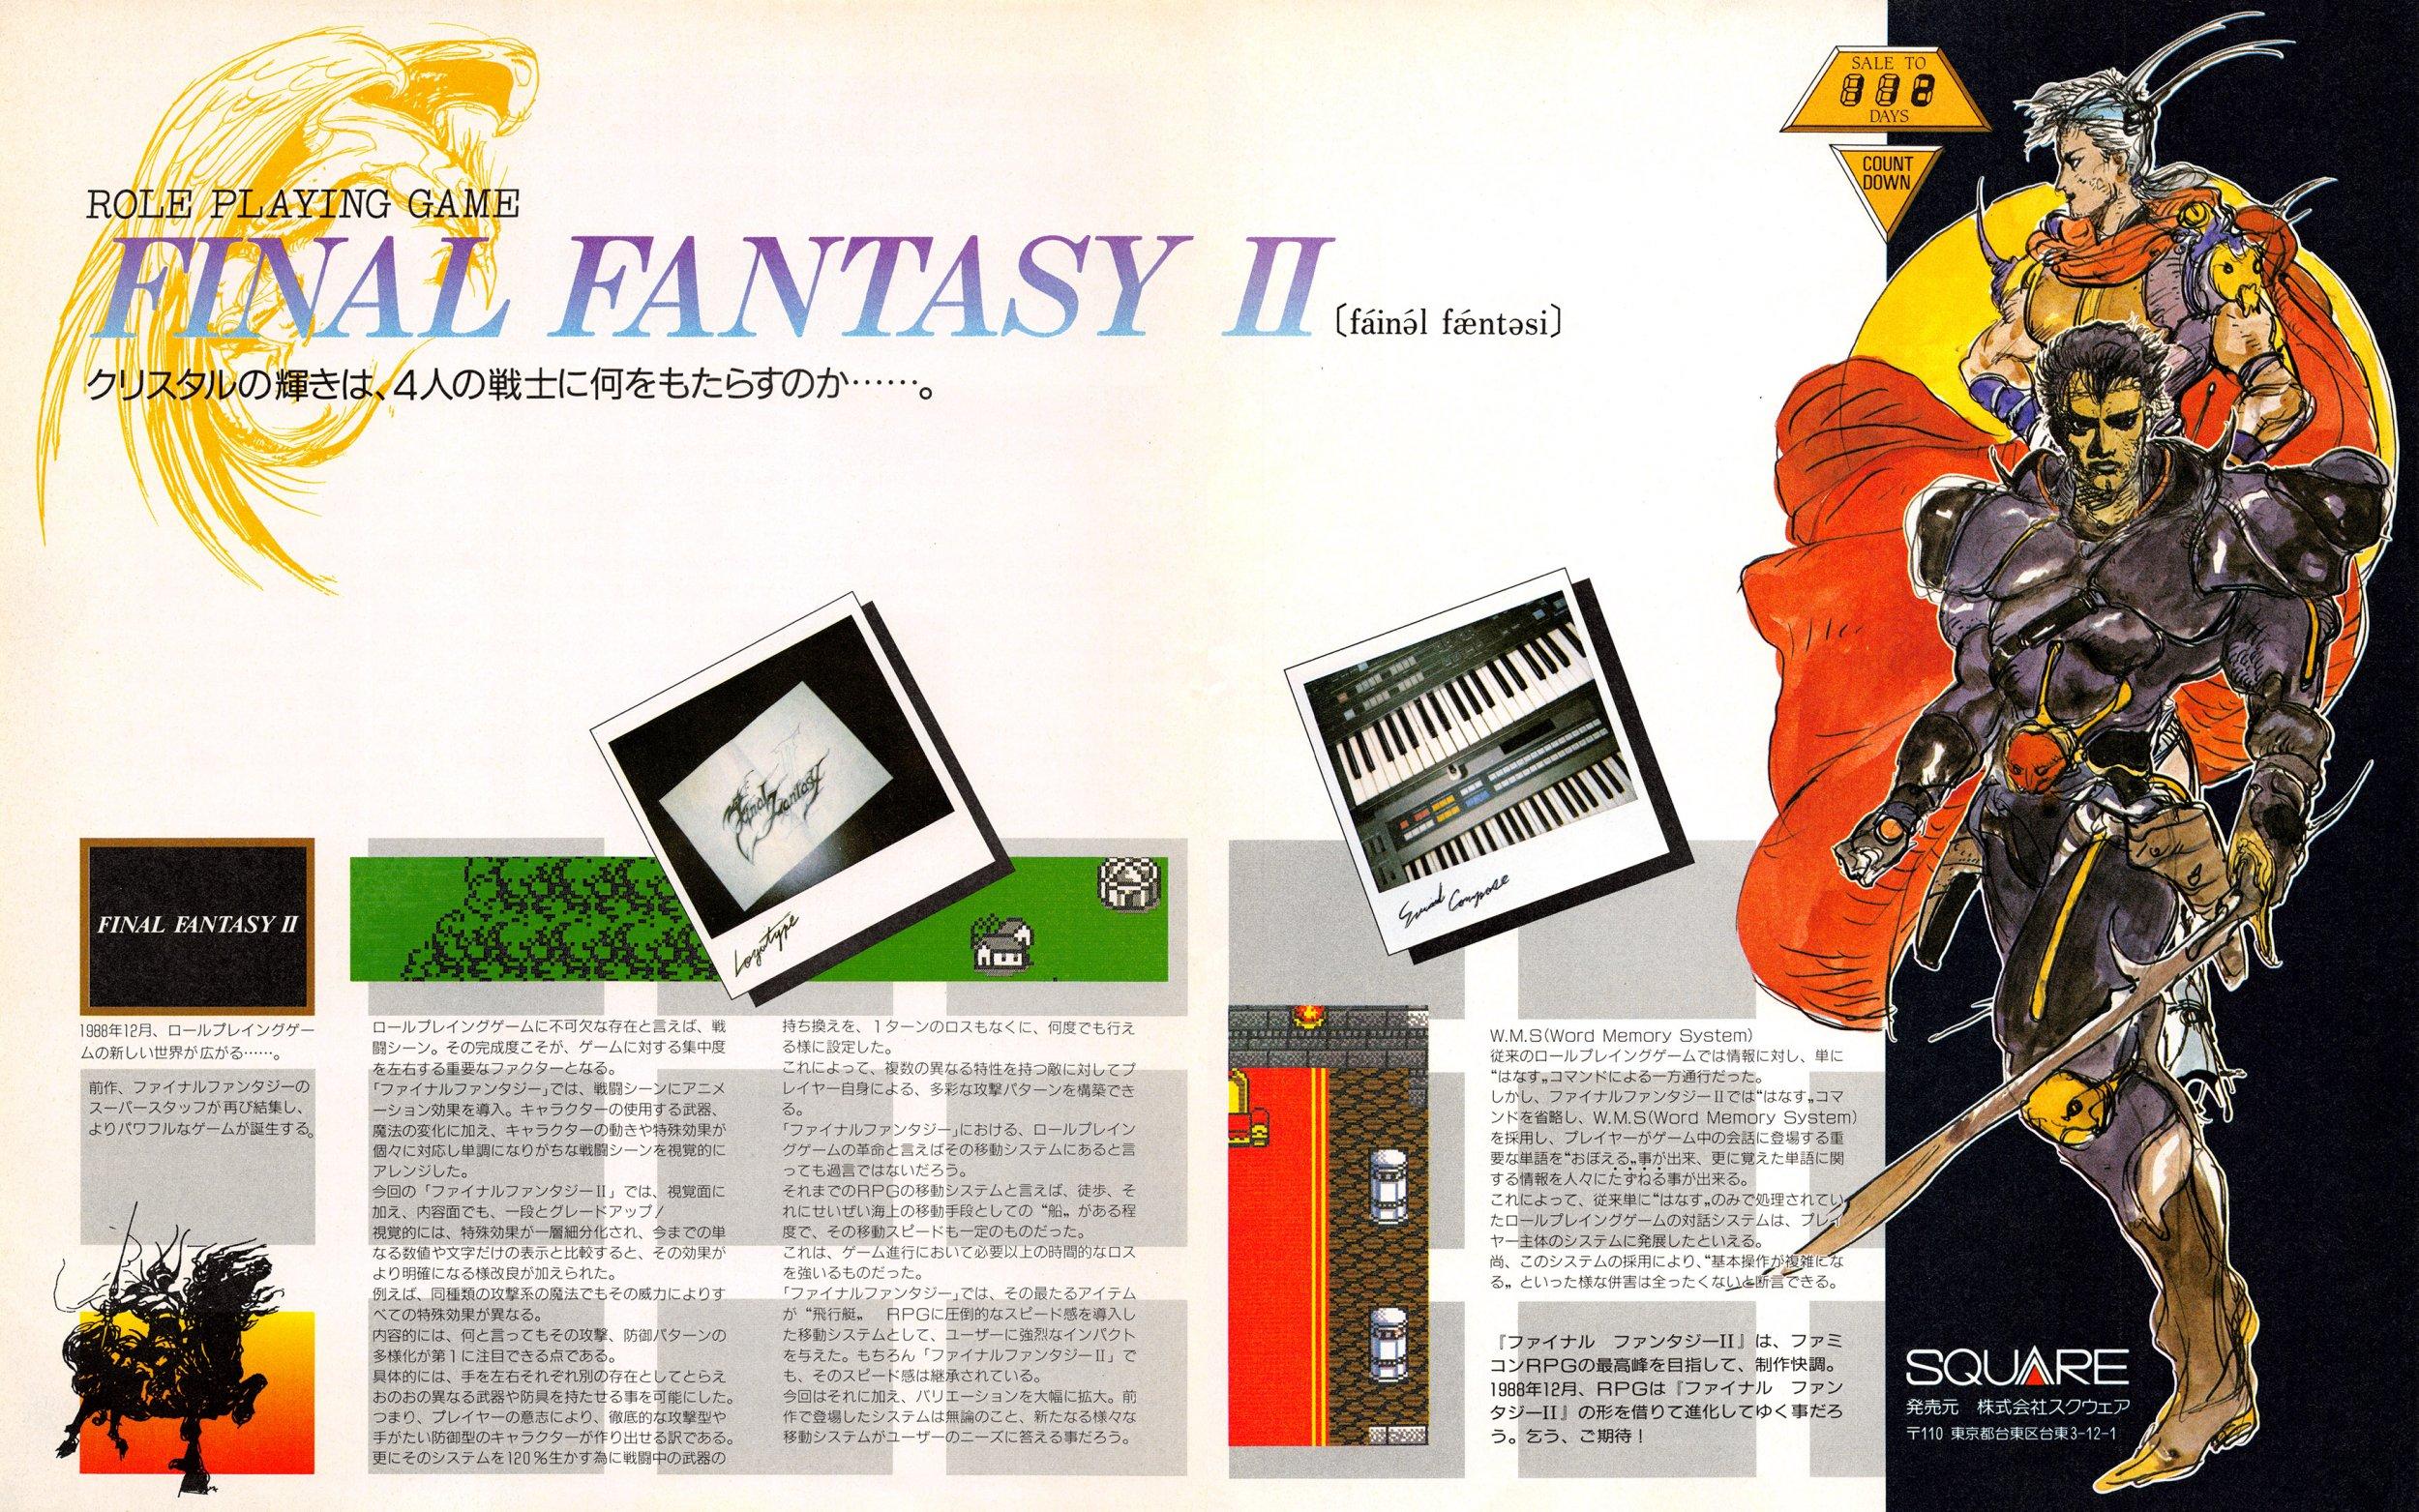 Final Fantasy II (Japan)